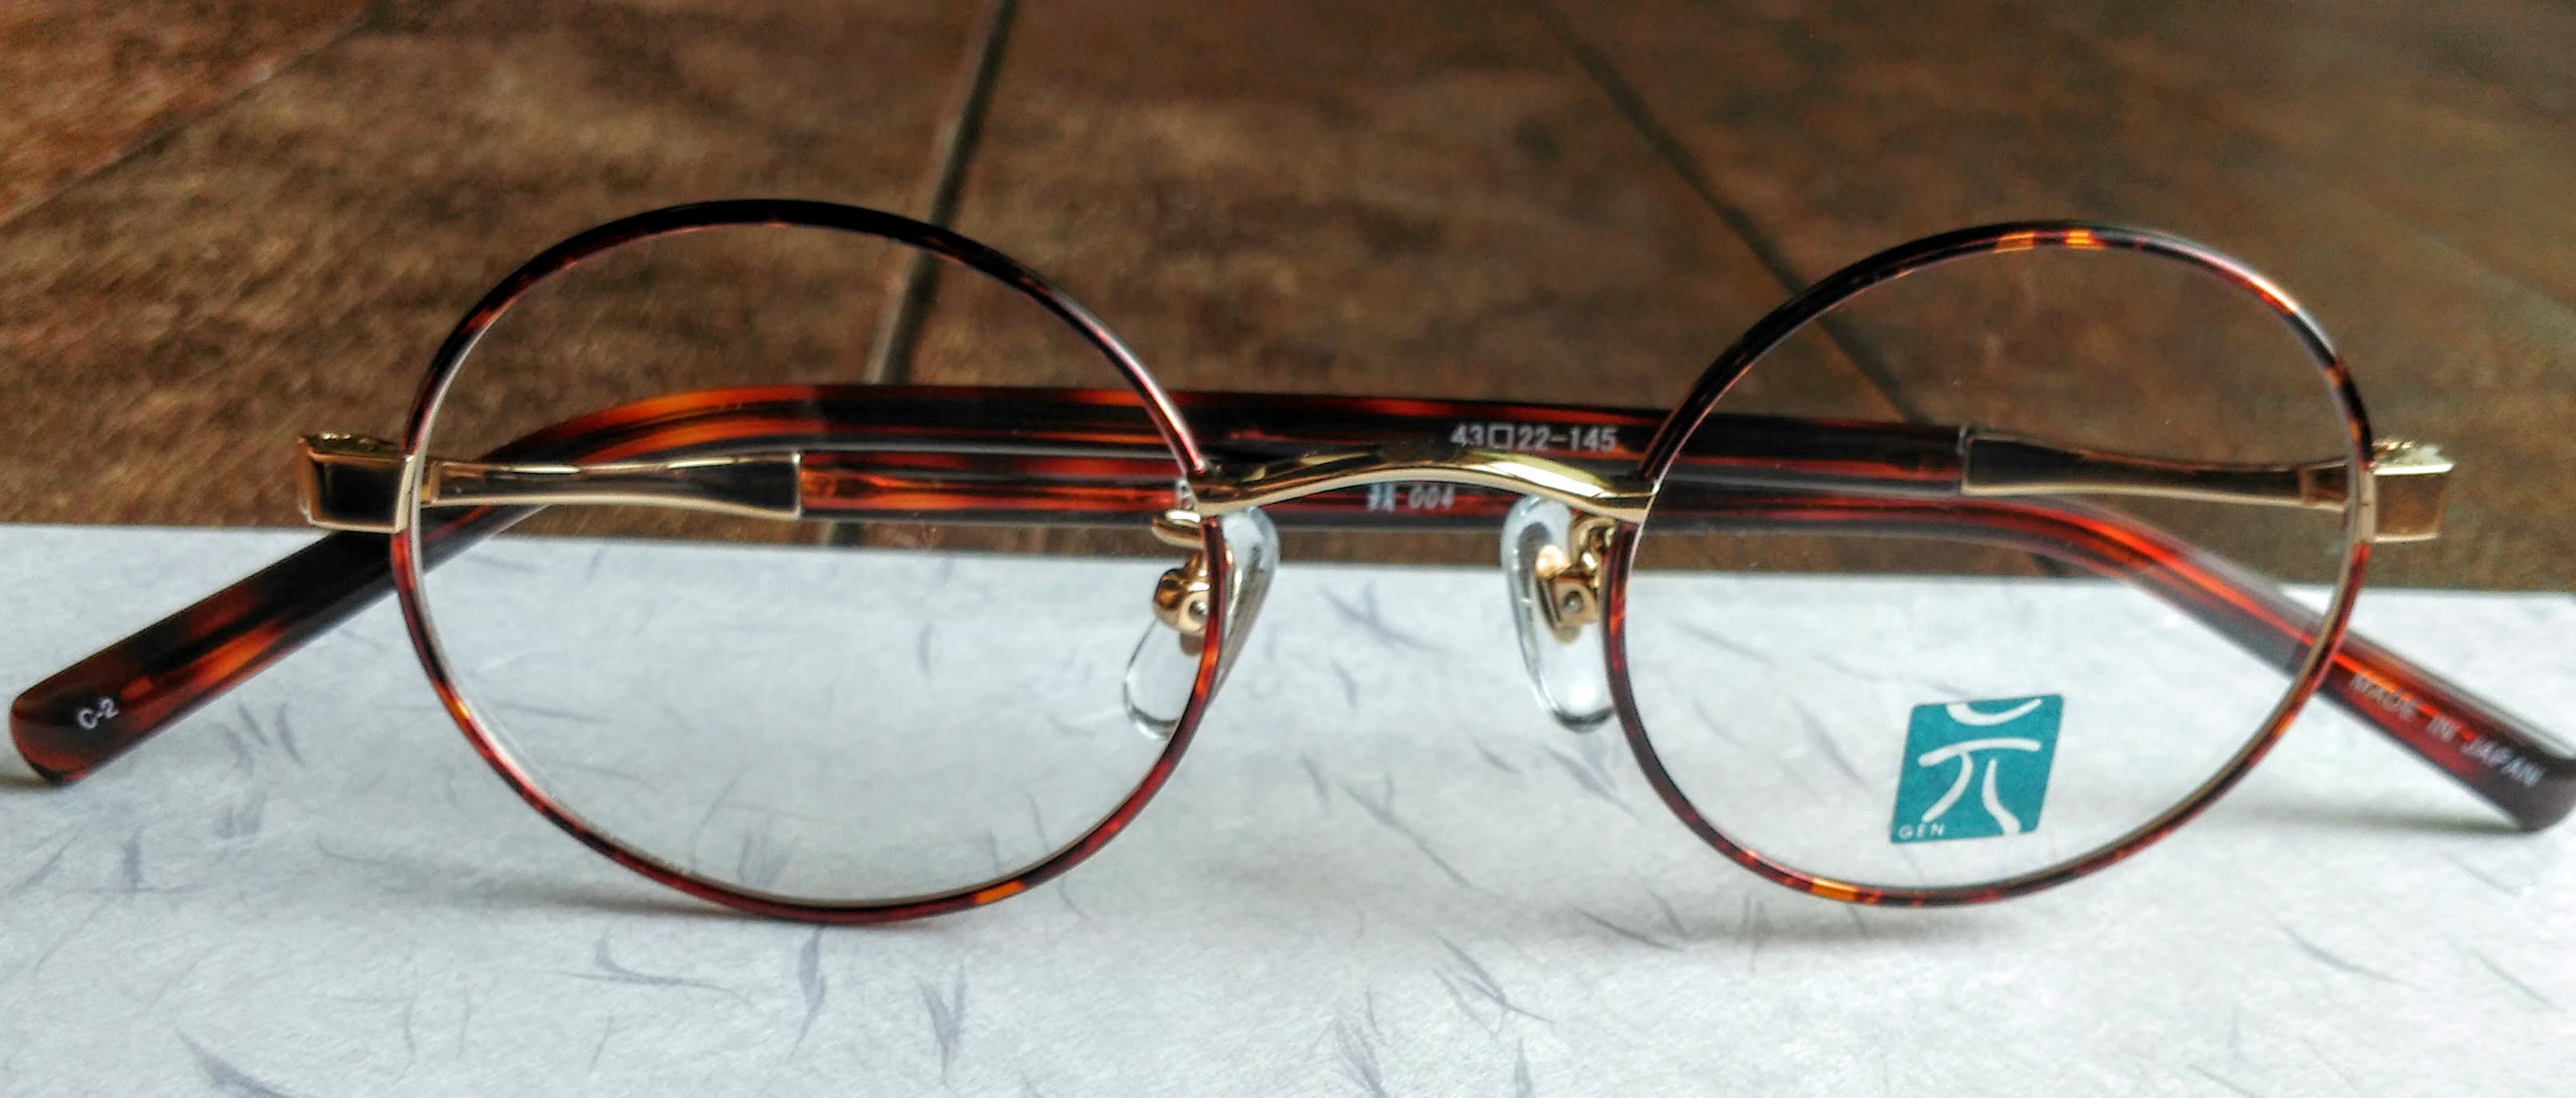 Japanese Handmade Titanium Eyeglass Frame on Washi Paper